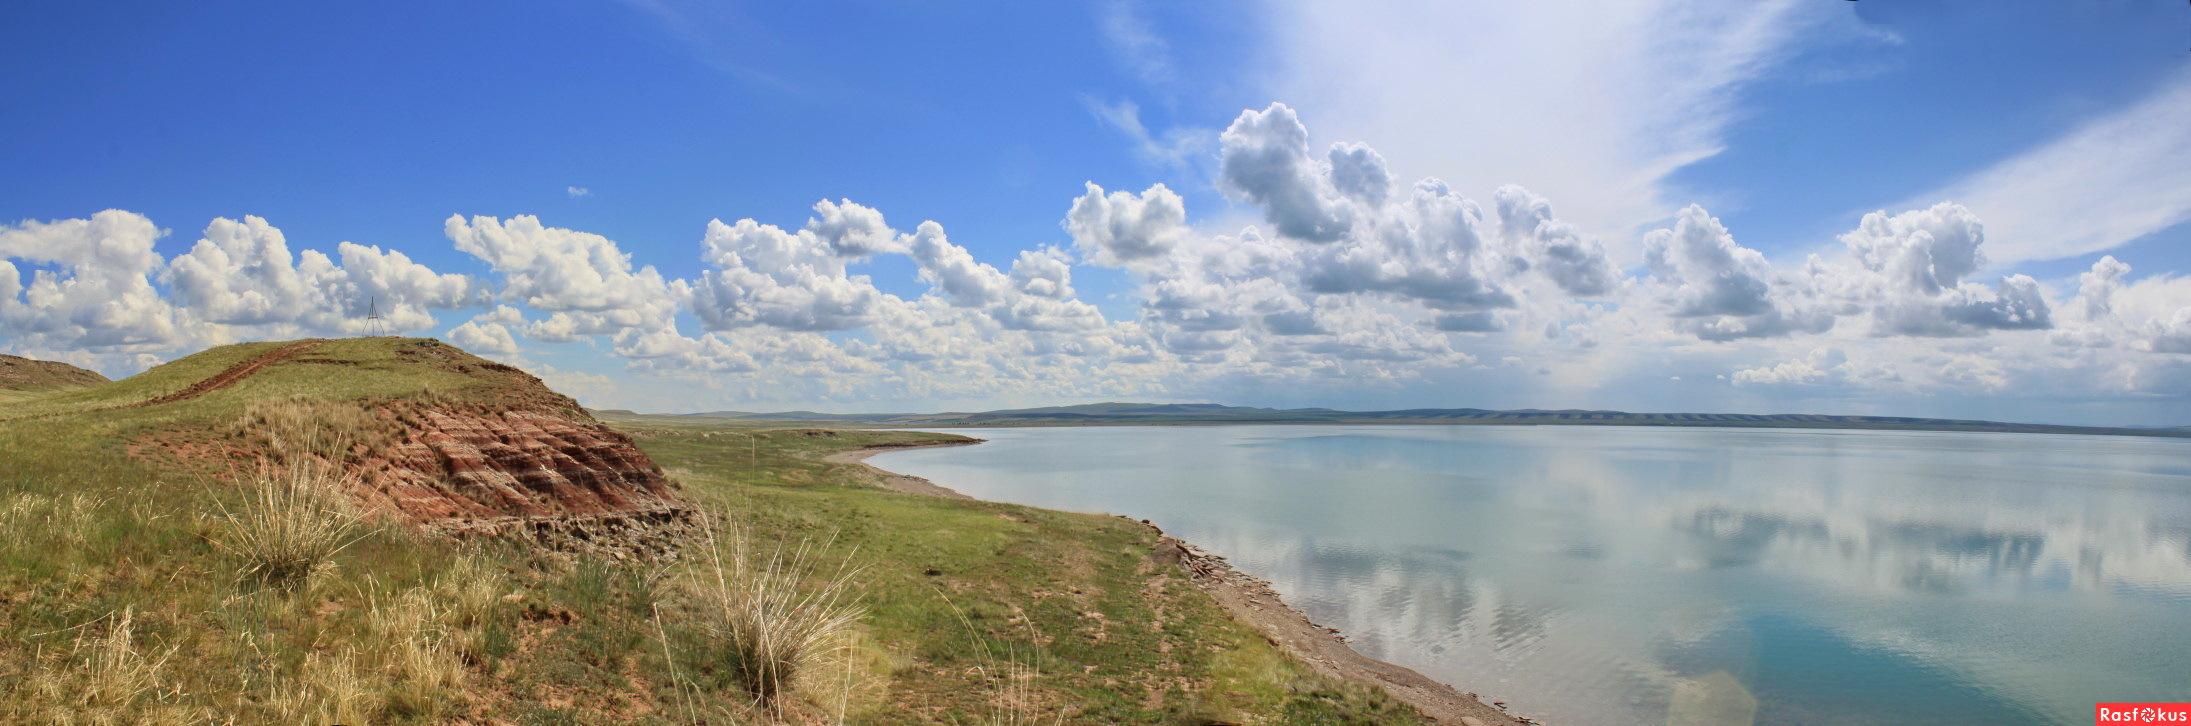 Фото: Панорама фото -Озеро Белё в Хакасии. Фотограф Галина Кузнечевская. Панорама - Фото и фотограф на Расфокусе.